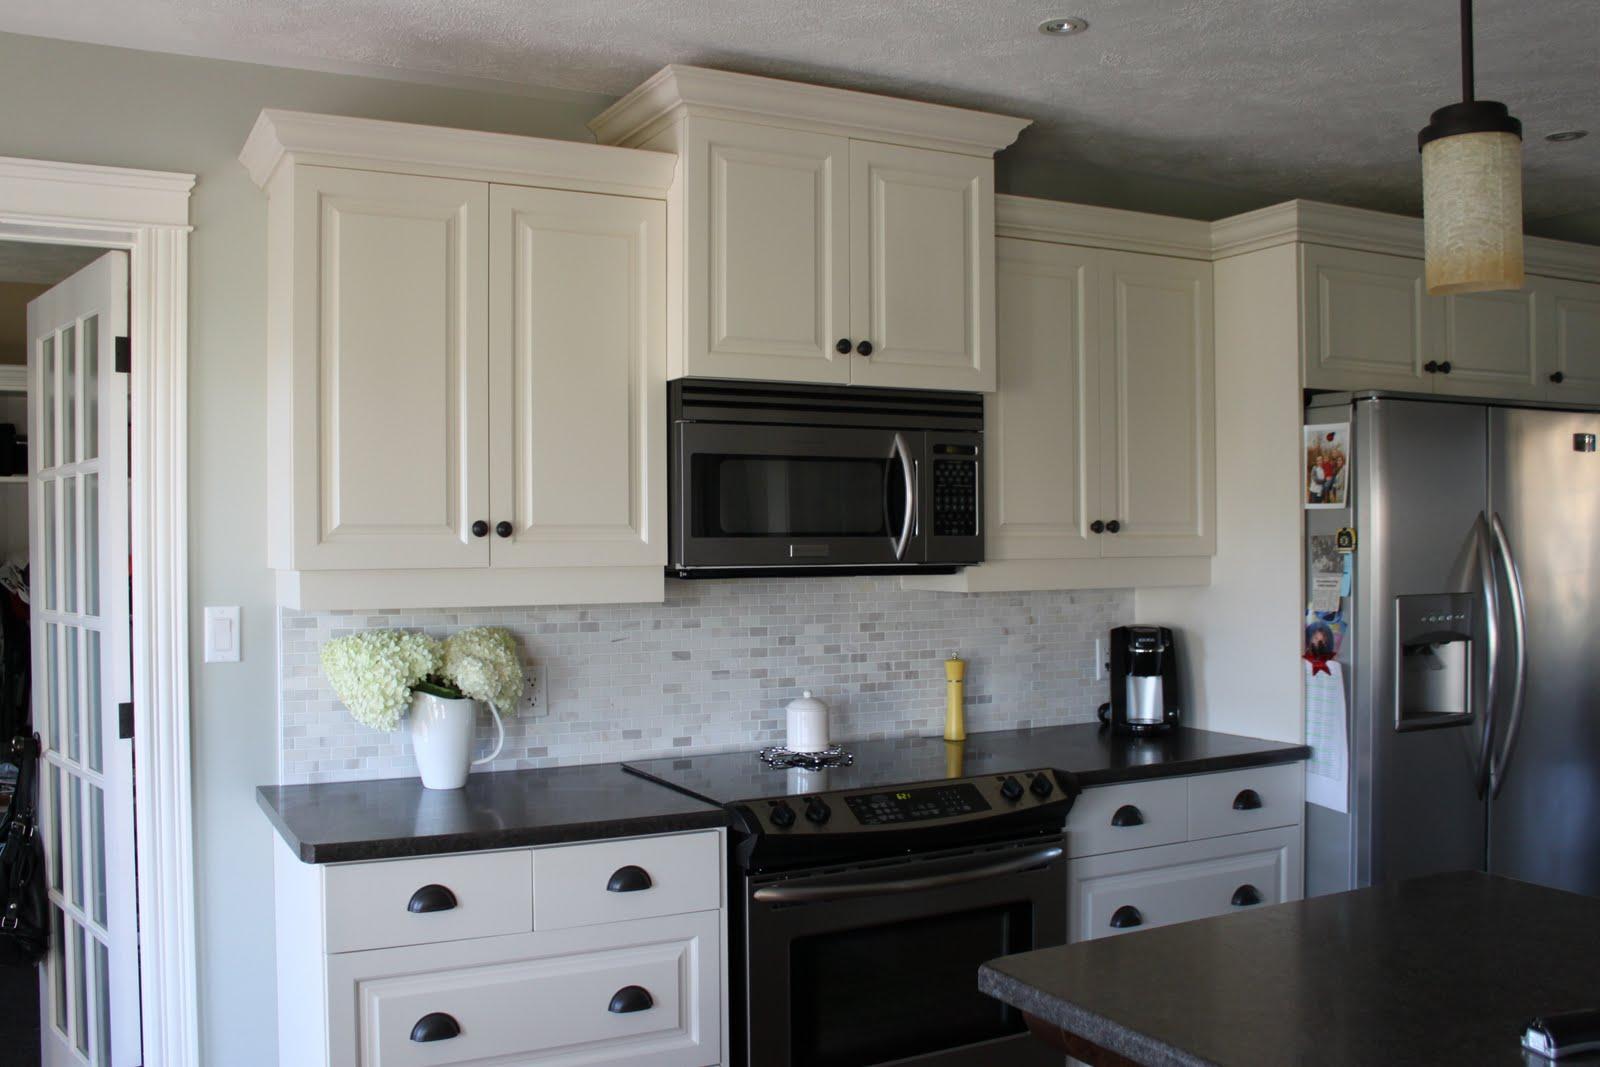 modern jane: A Glimpse Into Julie's Home. on Black Countertops With Black Backsplash  id=54059